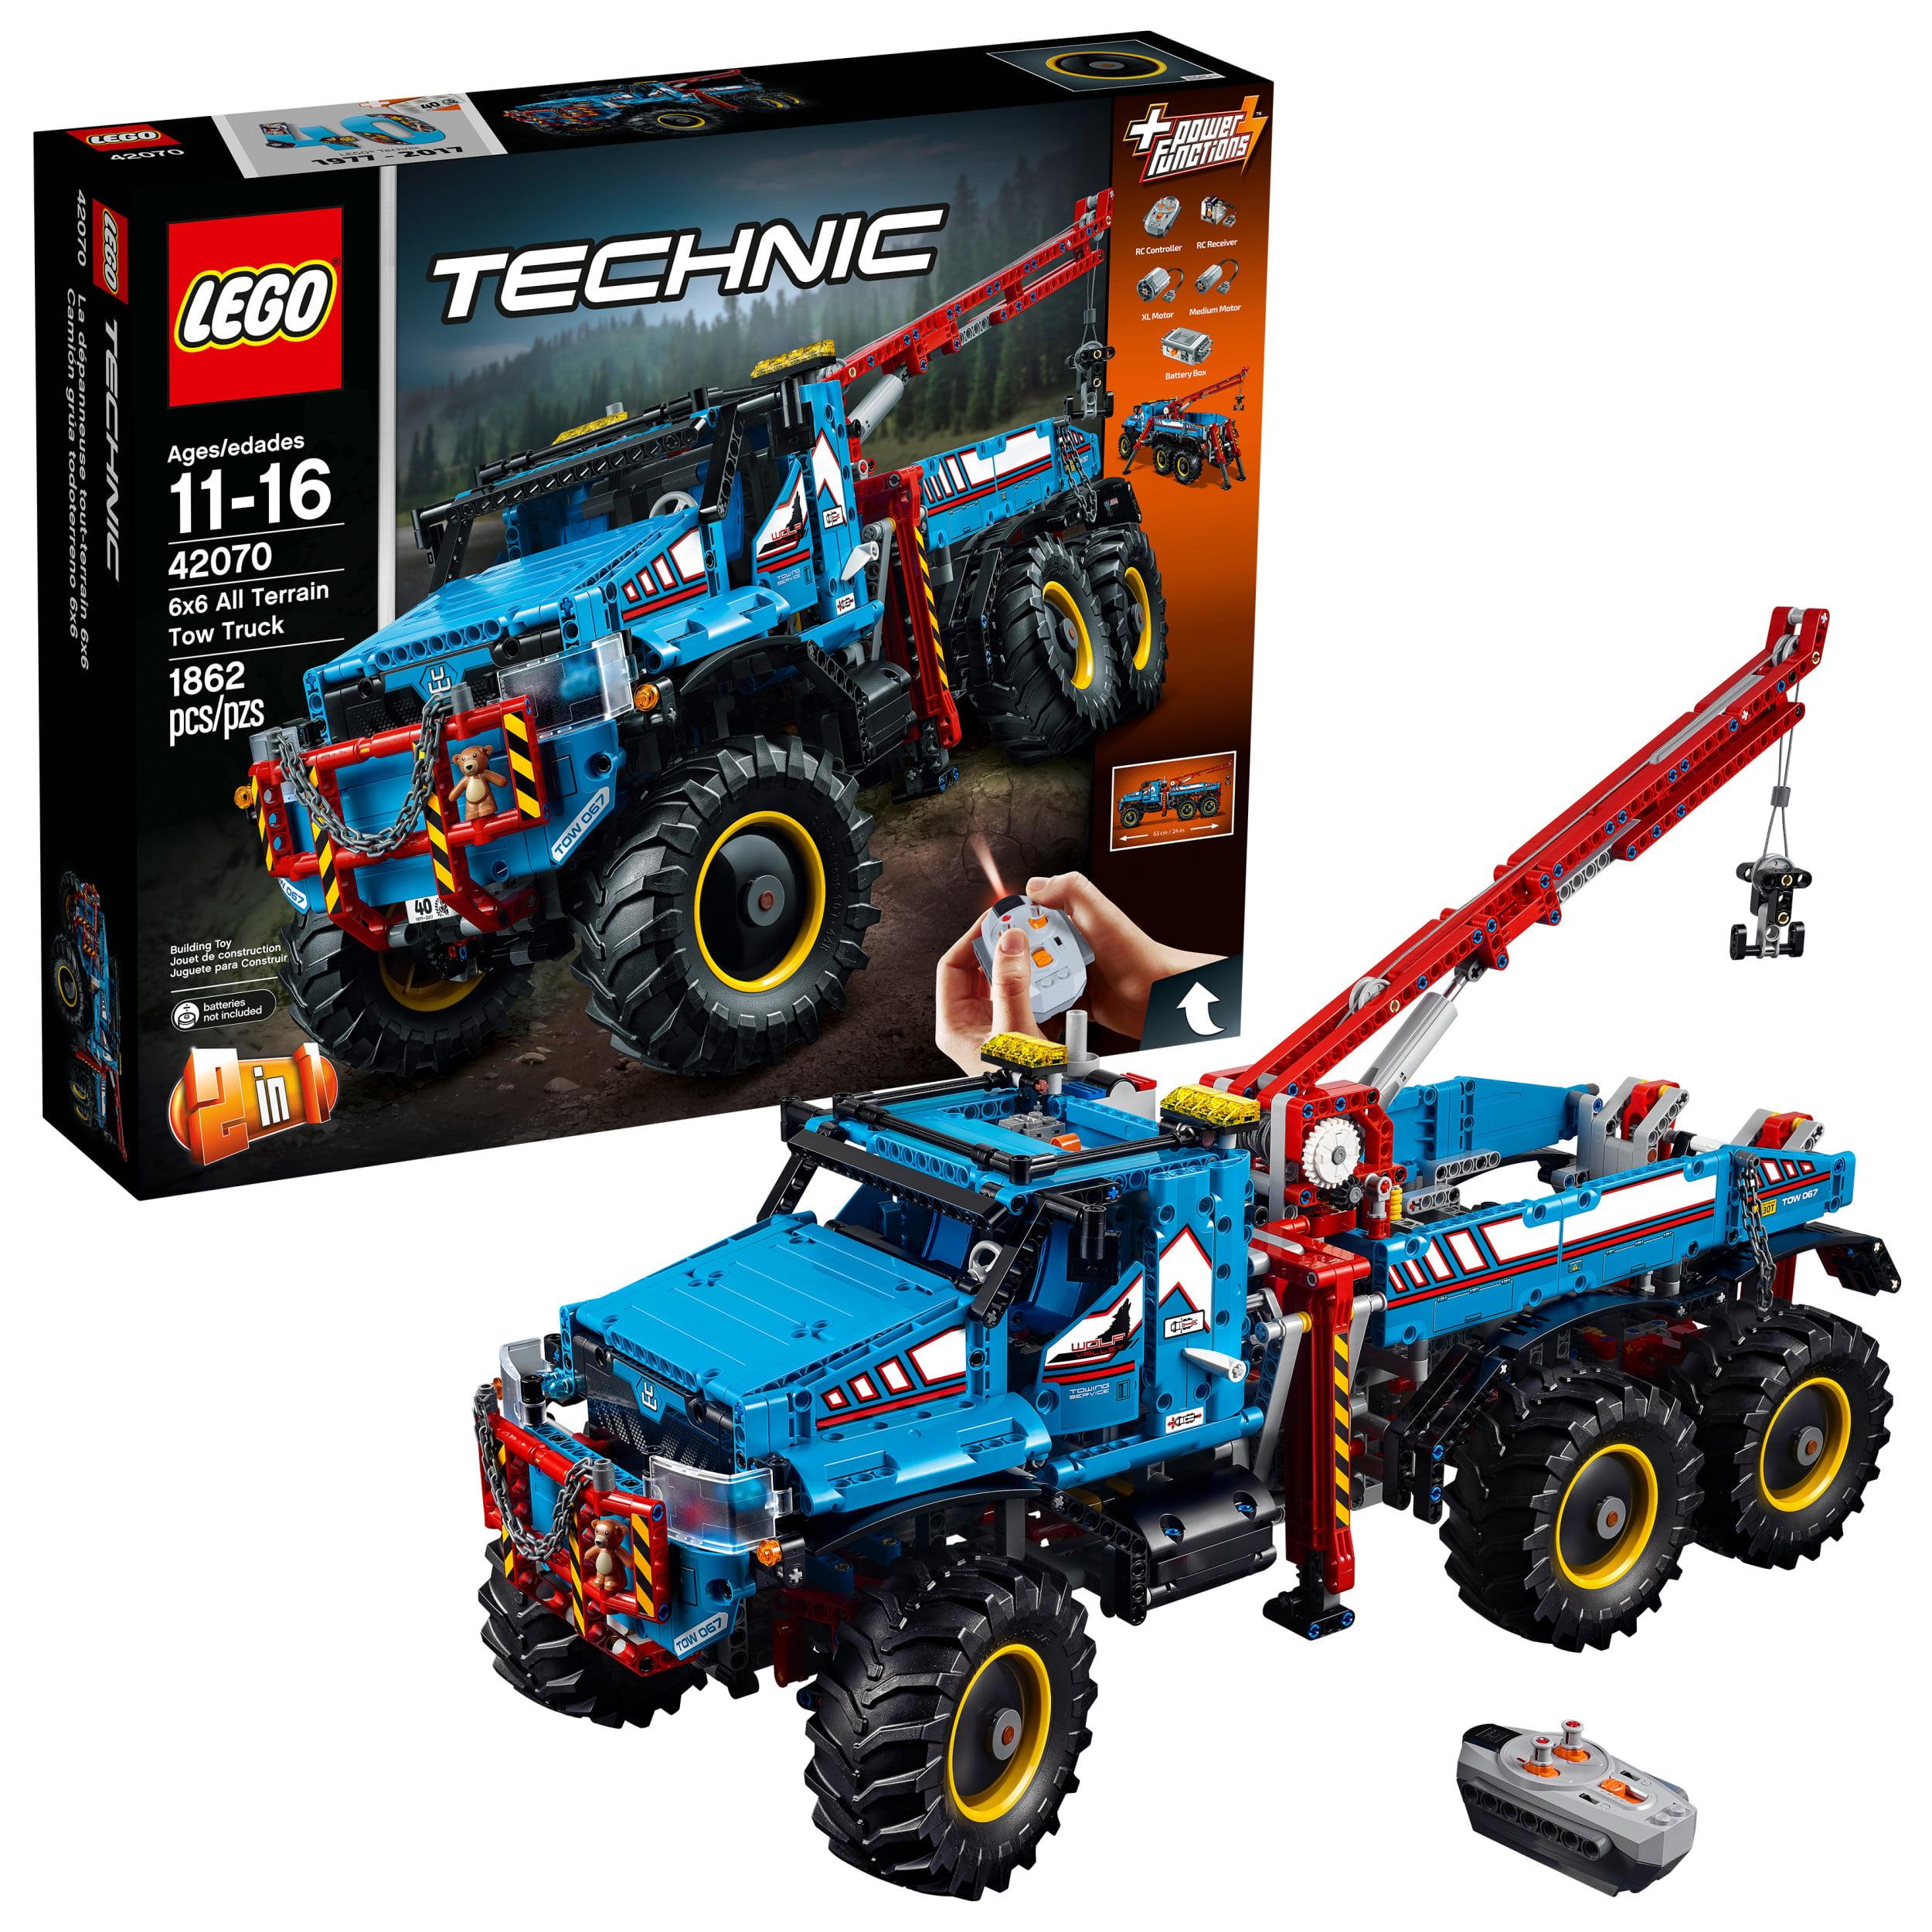 Lego Technic 6x6 All Terrain Tow Truck 42070 by LEGO System Inc